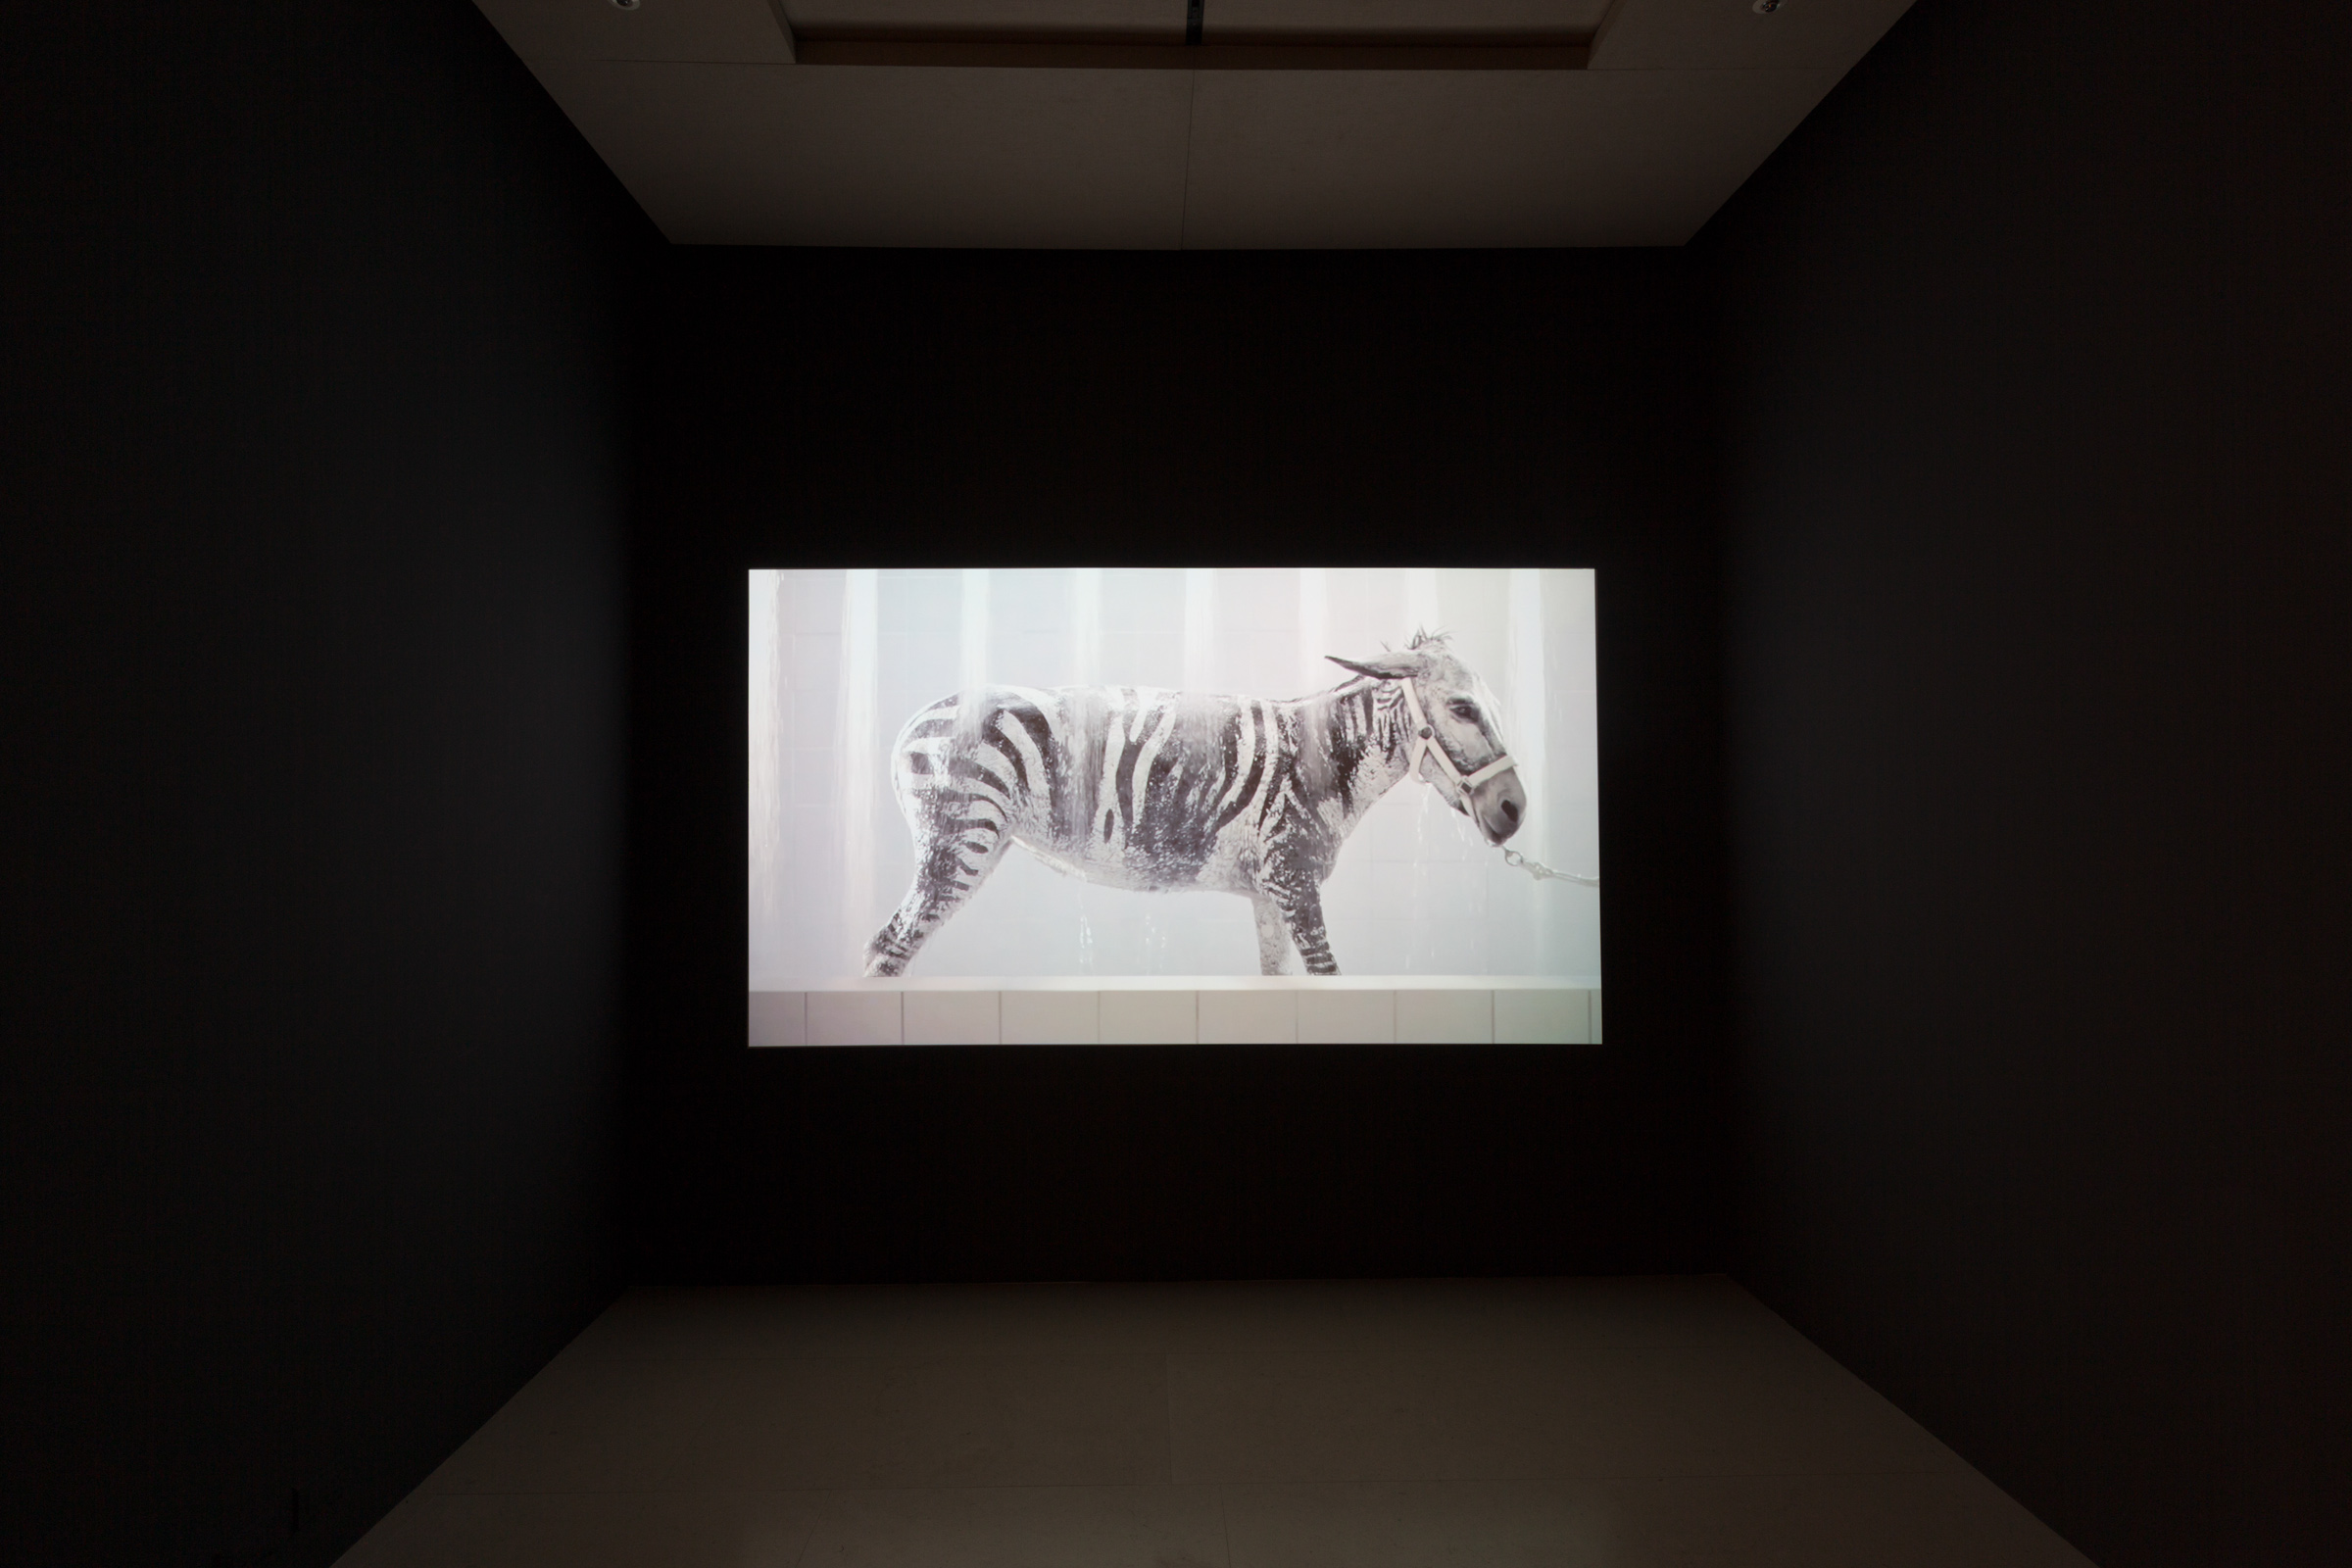 Sharif Waked, Gaza Zoo I (Bath Time), 2012, video